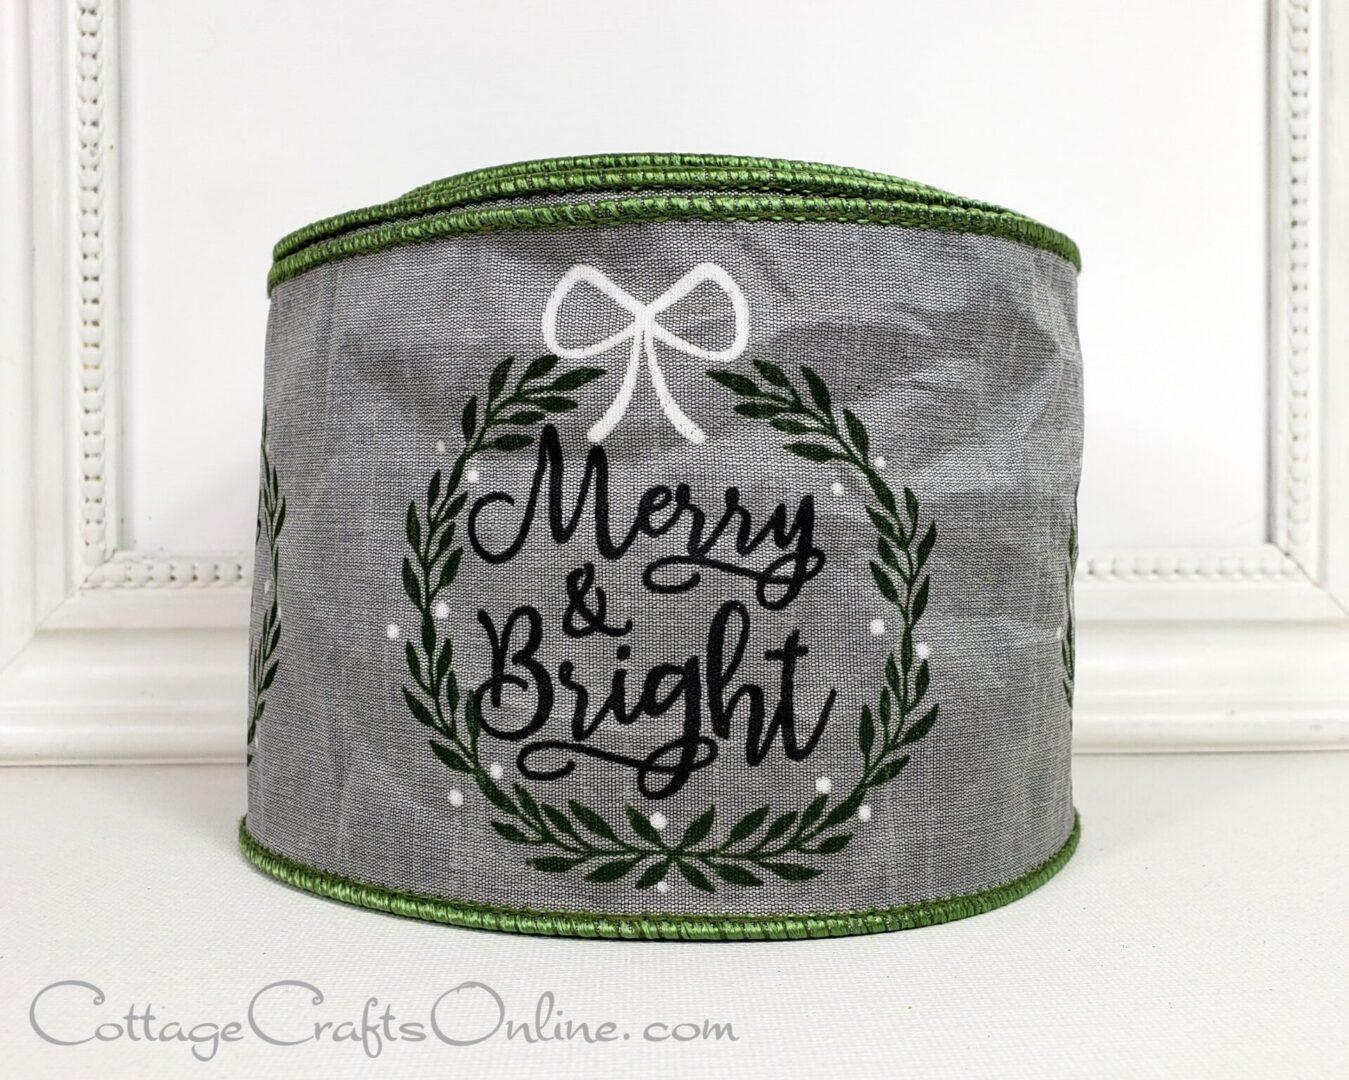 merry and bright ol 100 grey dupioni-024